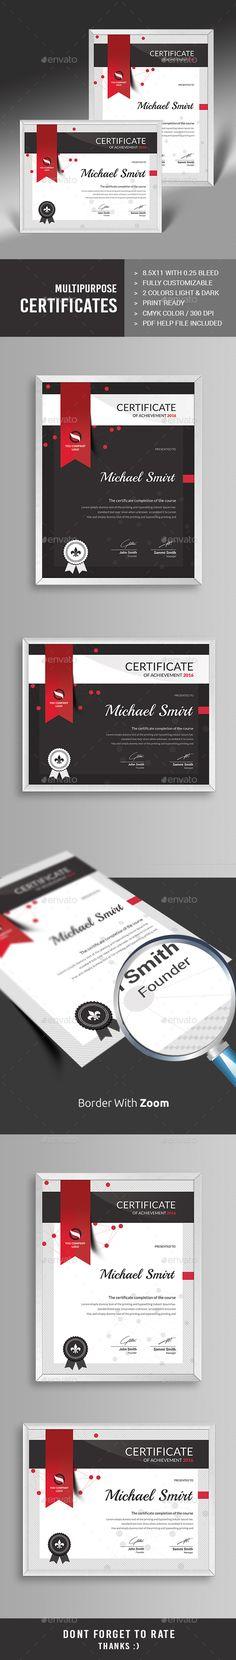 Multipurpose Certificates Template PSD. Download here: http://graphicriver.net/item/multipurpose-certificates/13459447?ref=ksioks